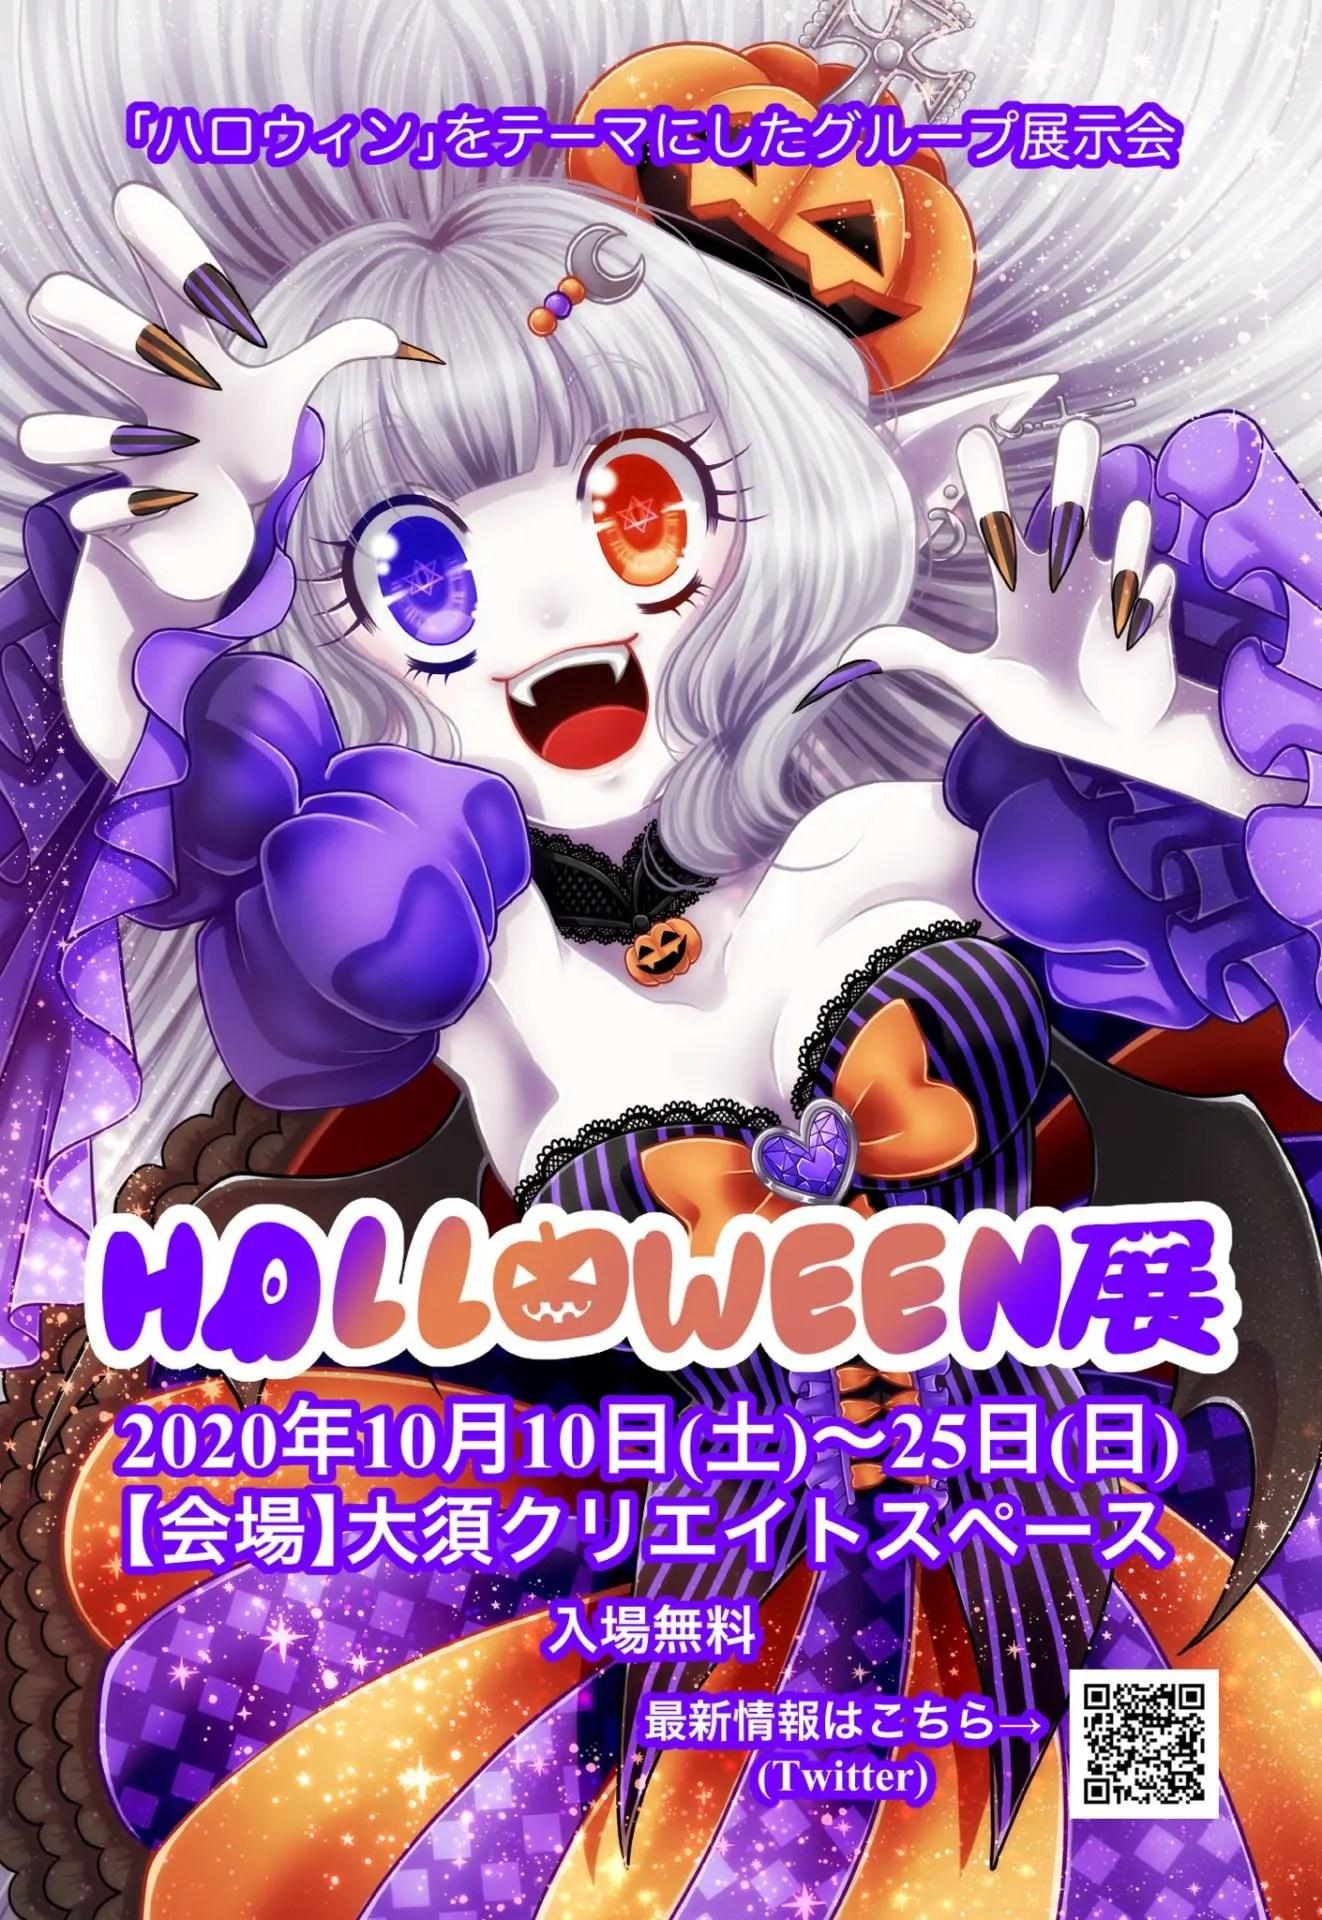 Halloween展